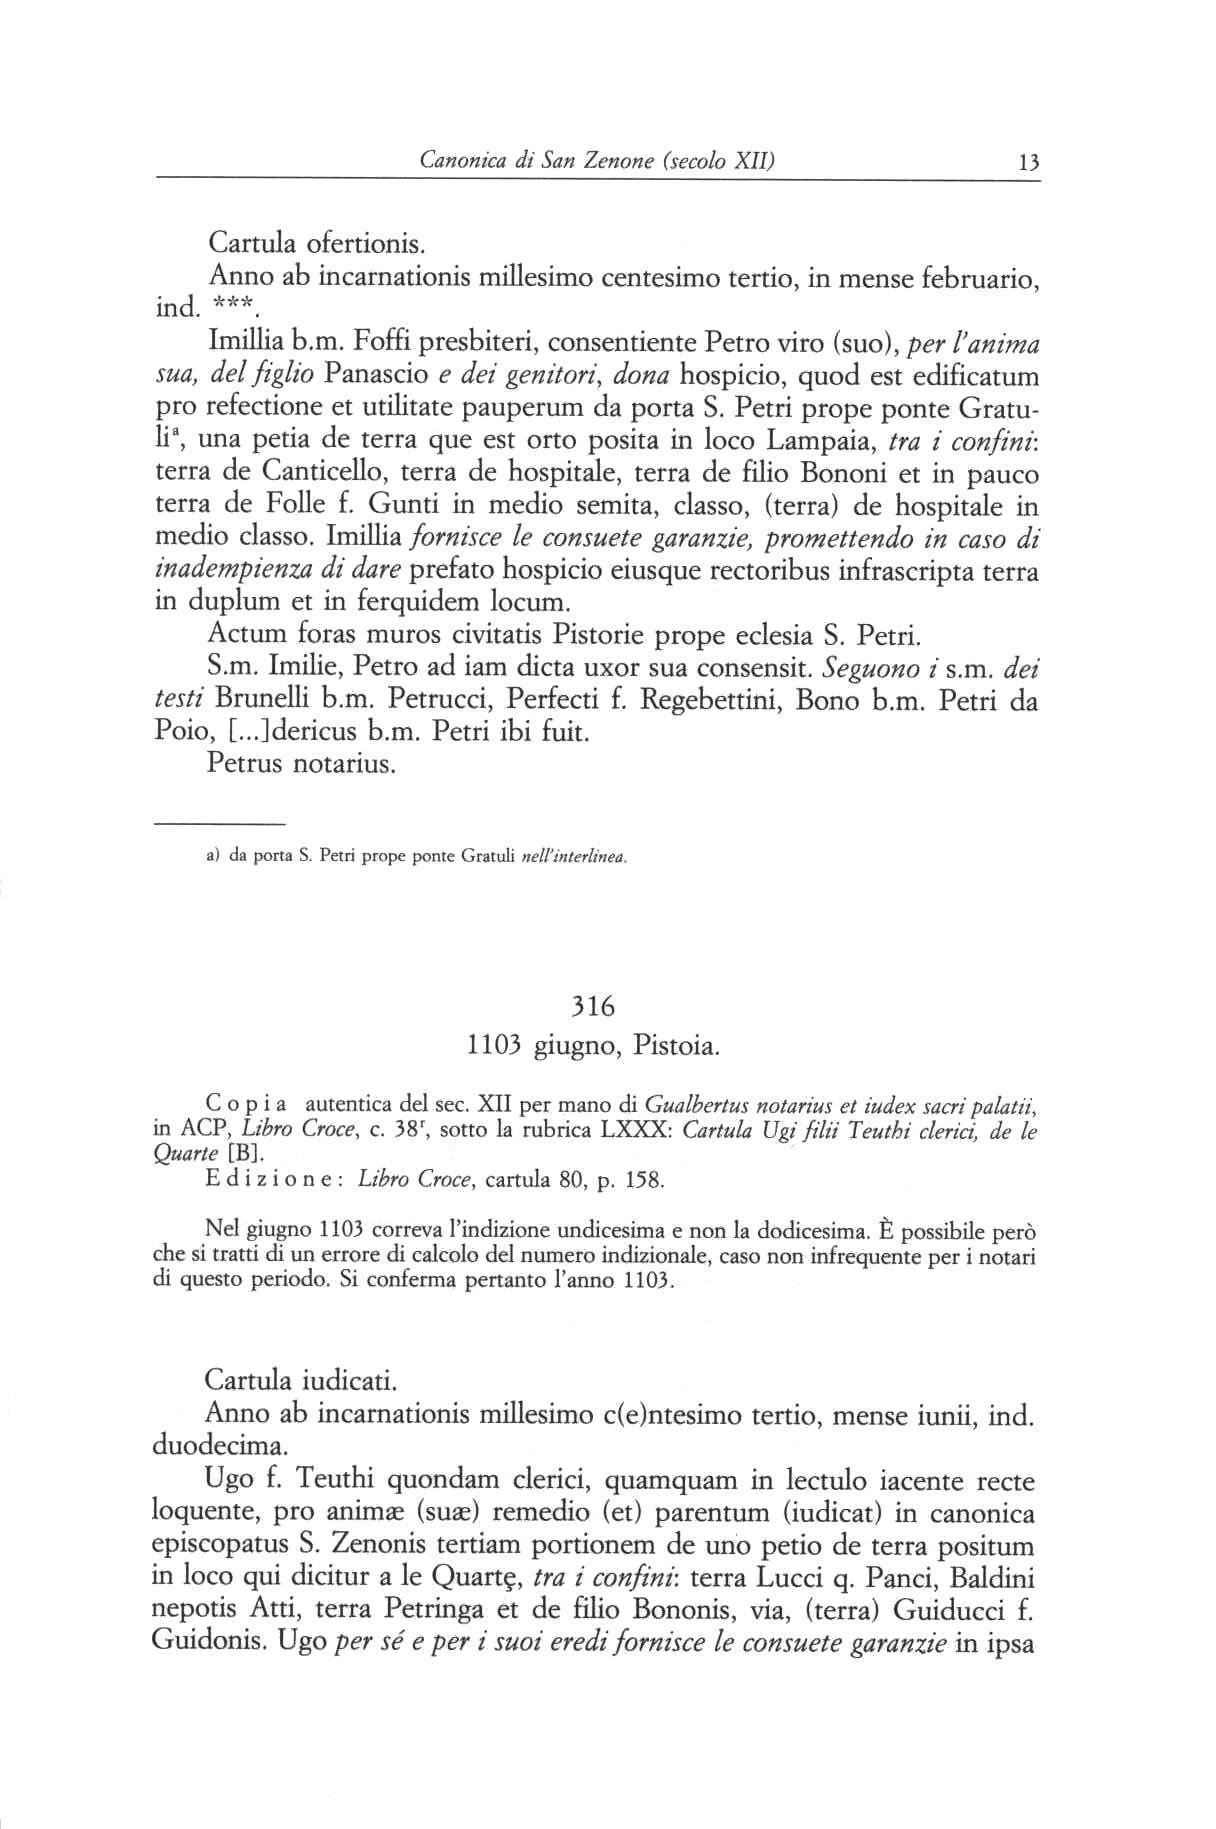 Canonica S. Zenone XII 0013.jpg